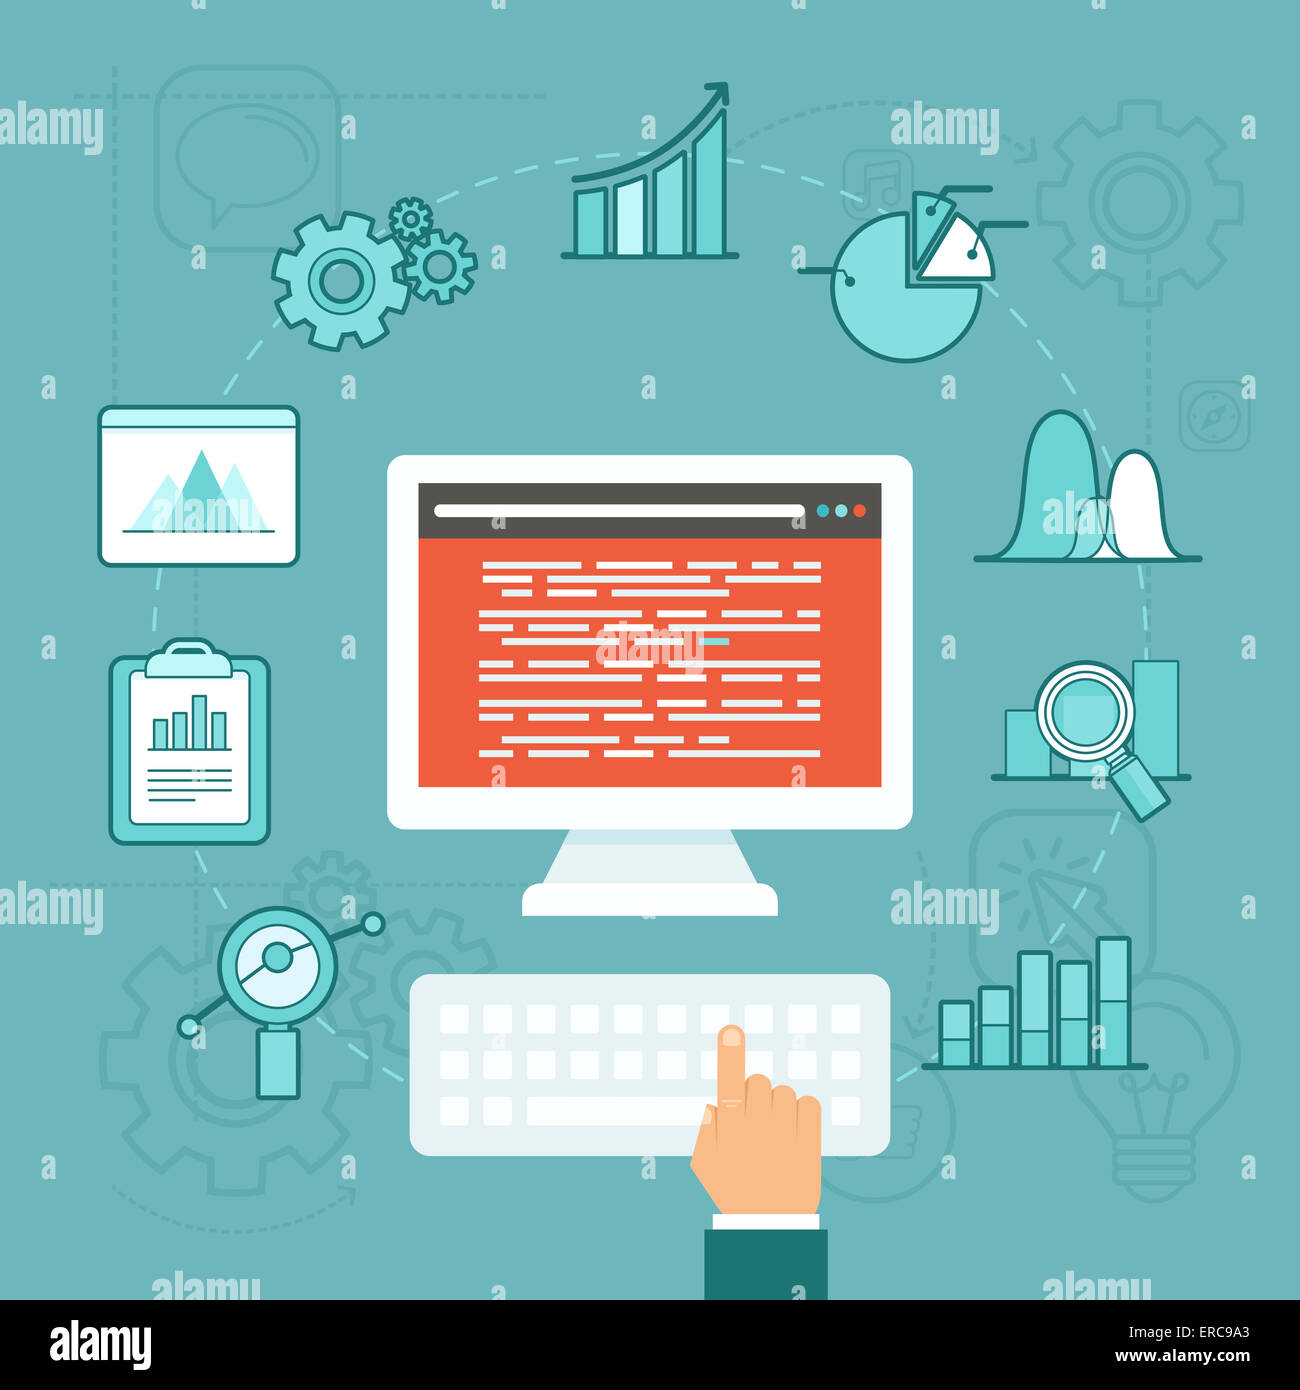 Data analytics concept in flat style - big data development - Stock Image